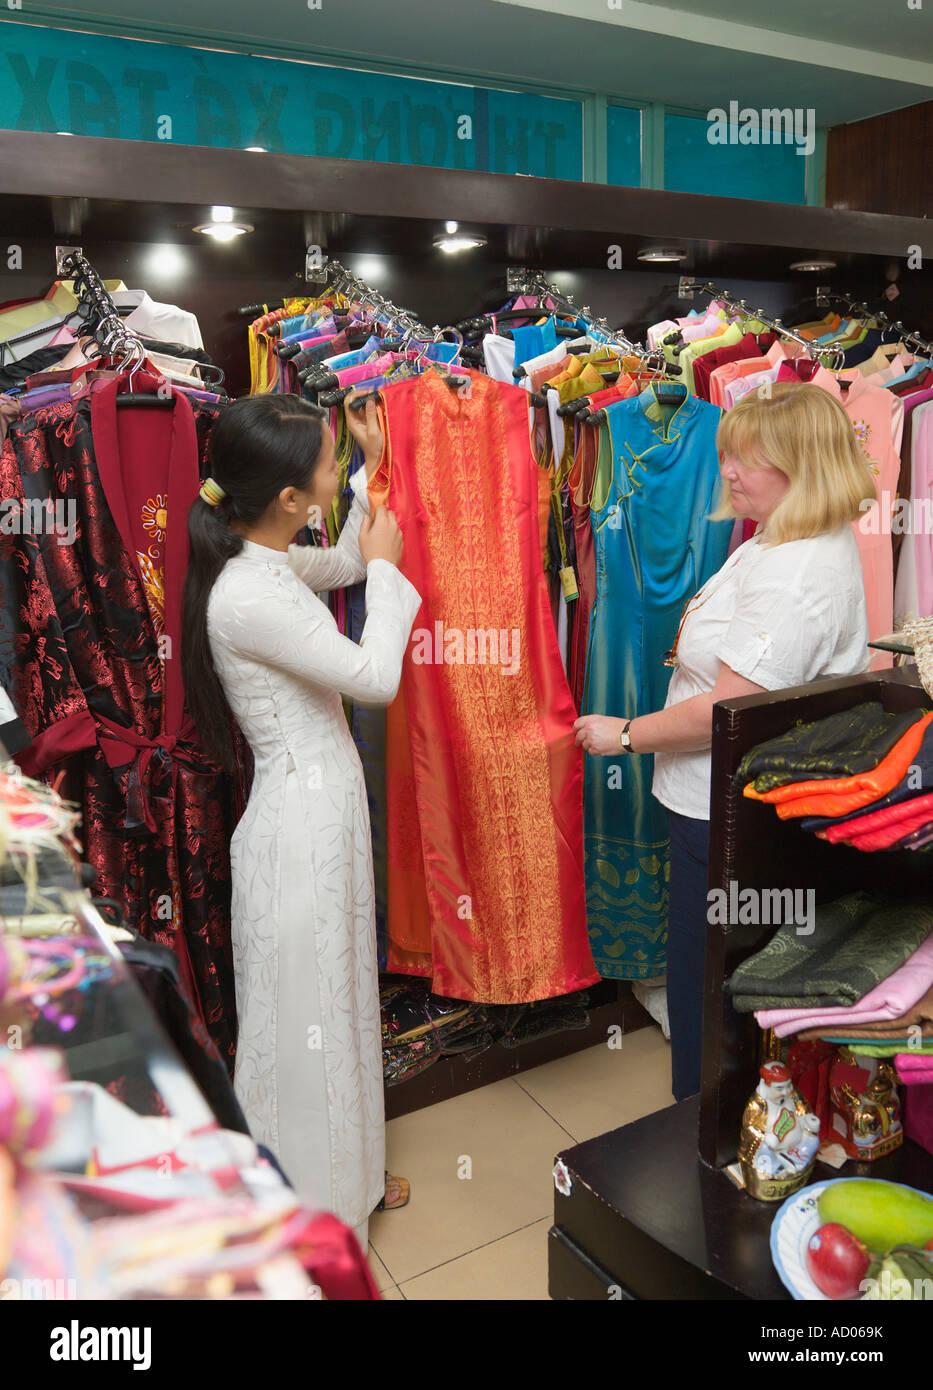 fd25e9463ac92 Woman customer shopping for clothes in 'Saigon Tax Trade Centre' 'Ho Chi  Minh